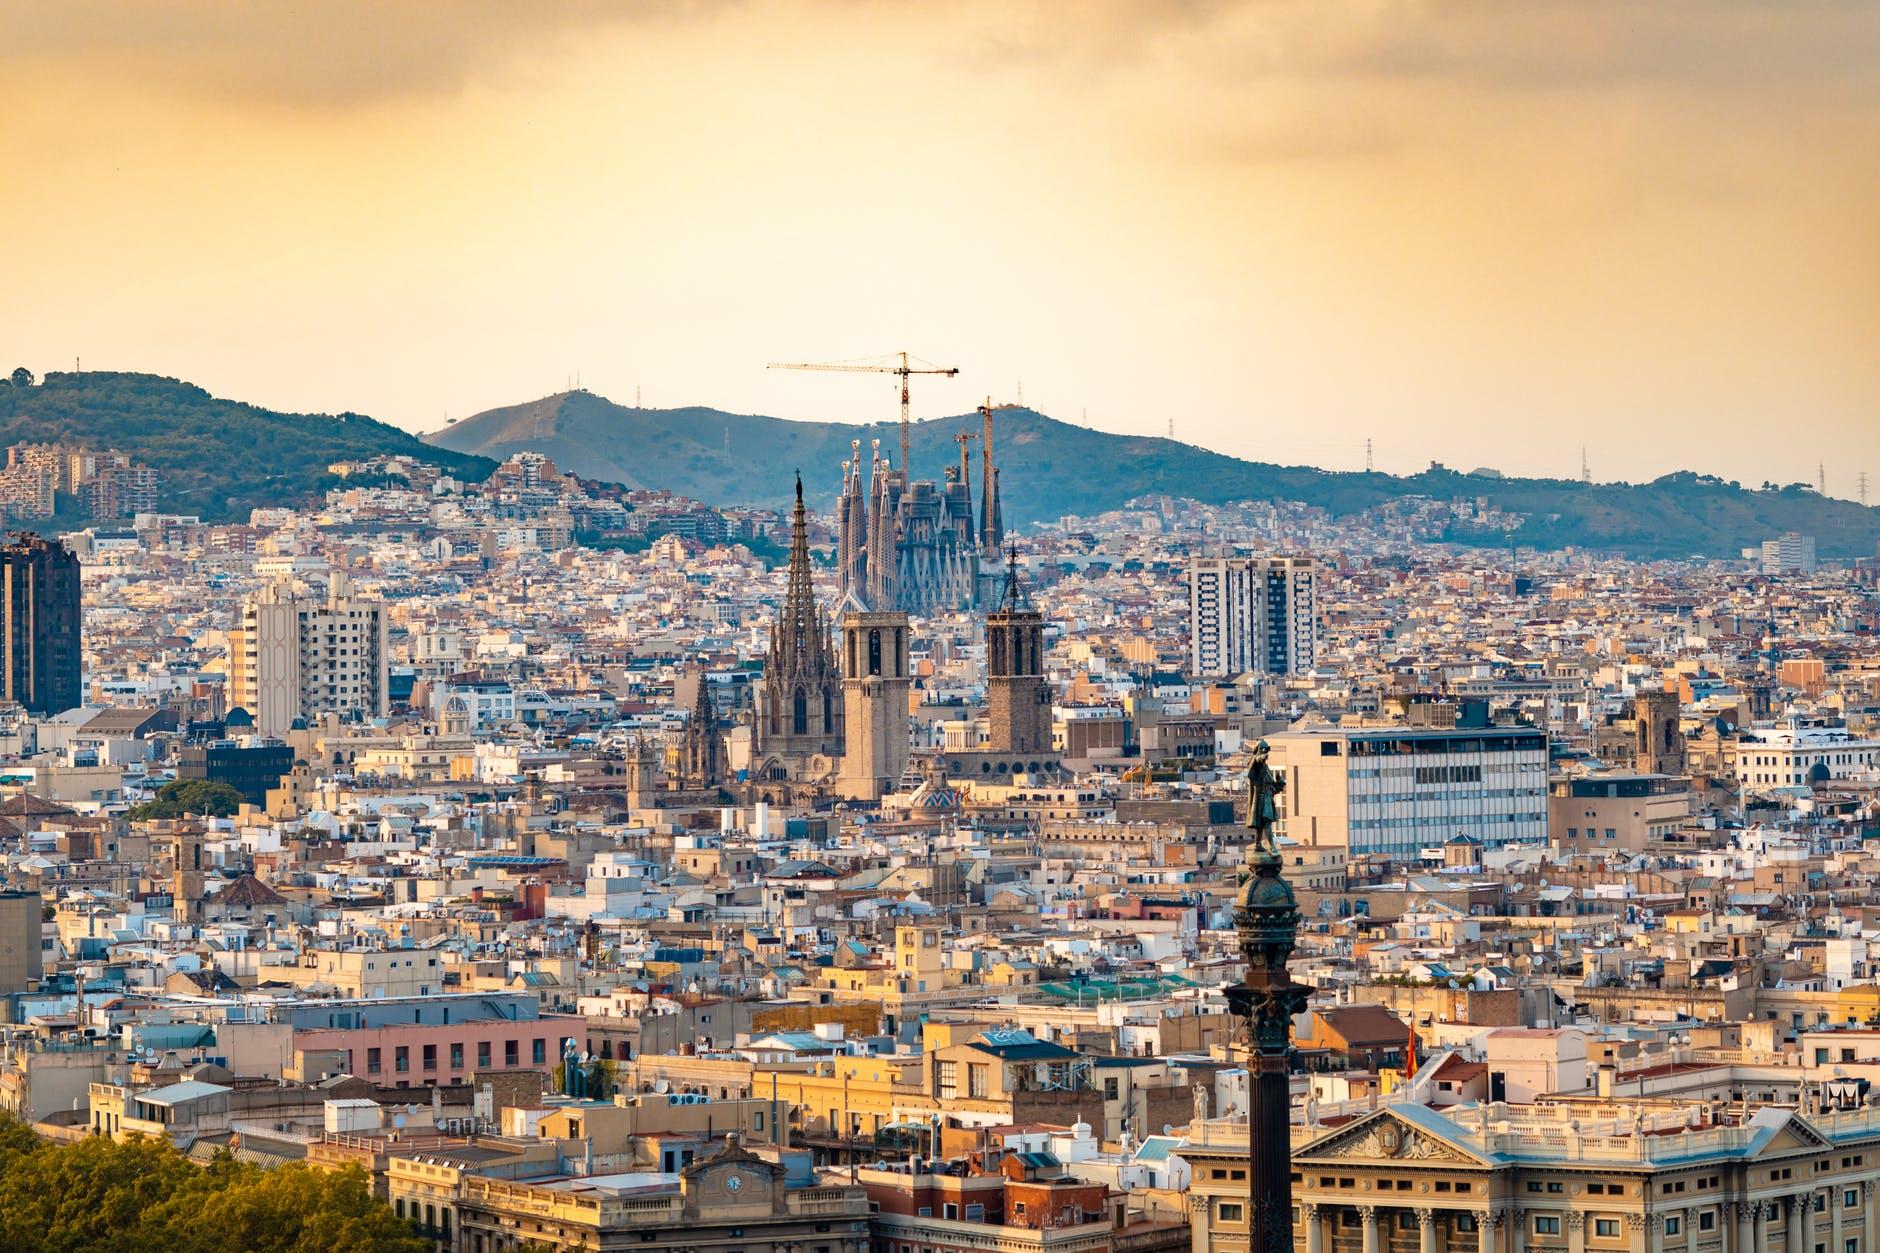 Sagrada Familia Barcelona Church ,most famous churches in the world